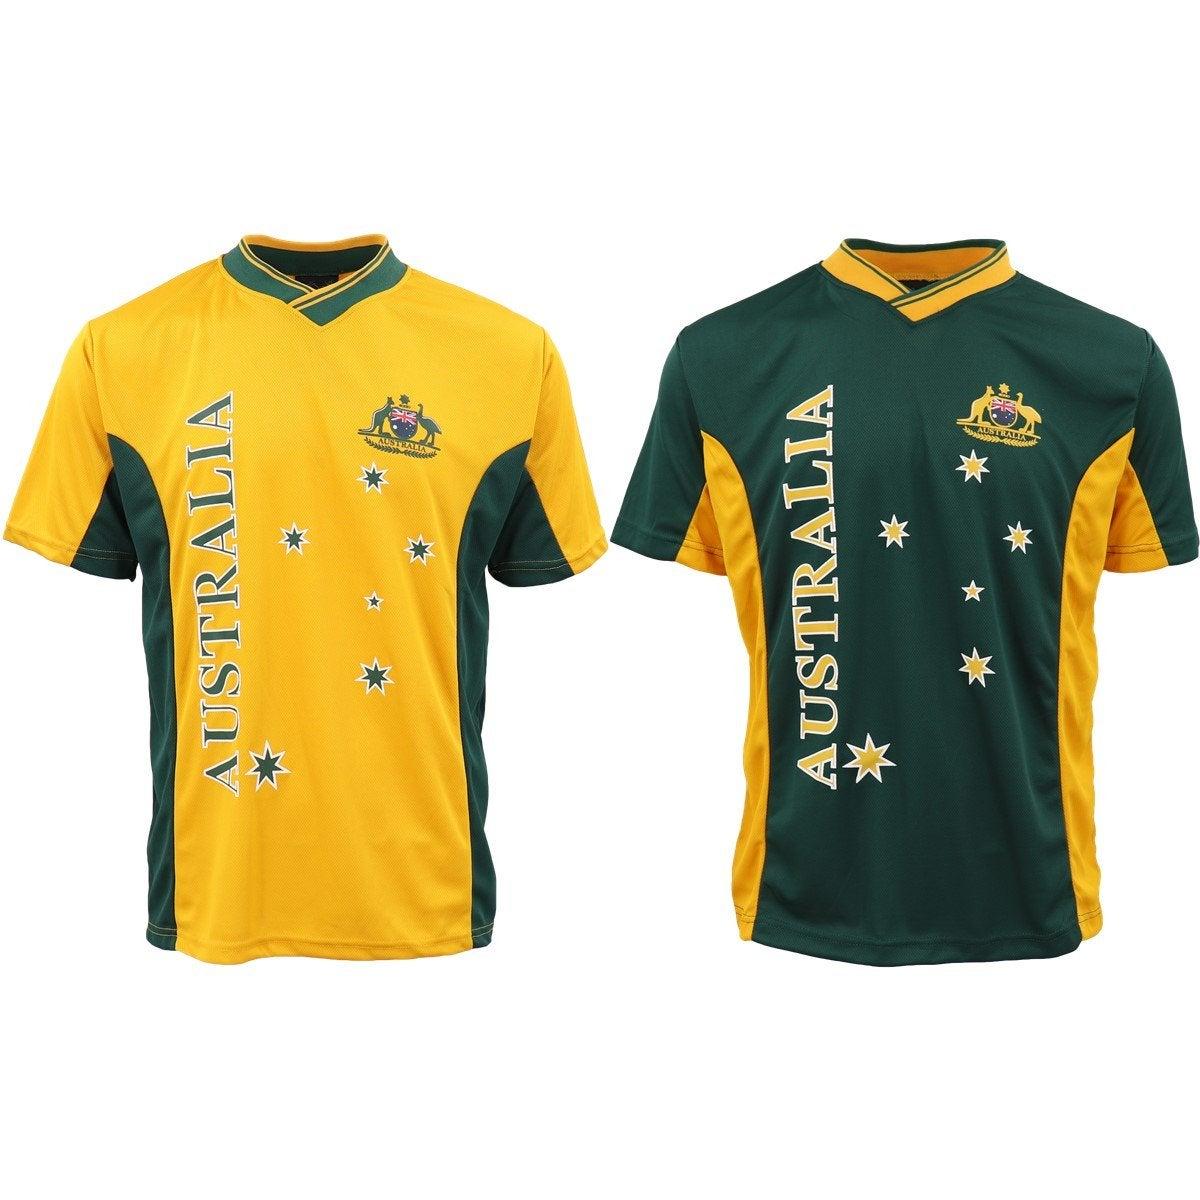 Adults Kids Men's Sports Soccer Rugby Jersy T Shirt Australia Day Polo Souvenir